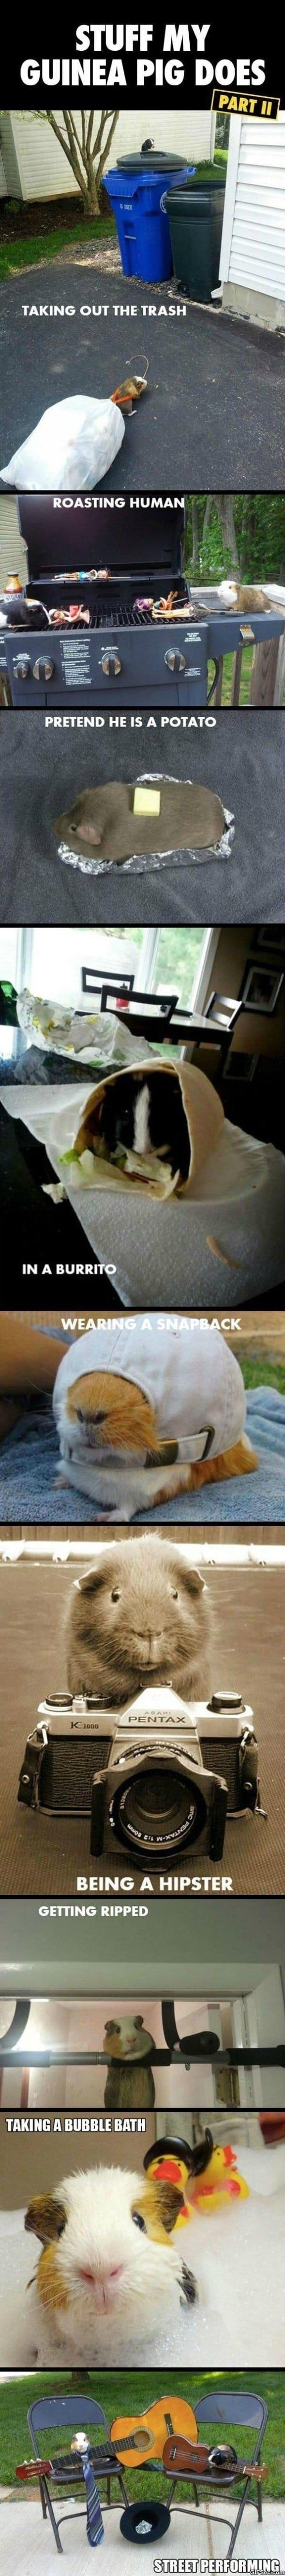 stuff-my-guinea-pig-does-meme